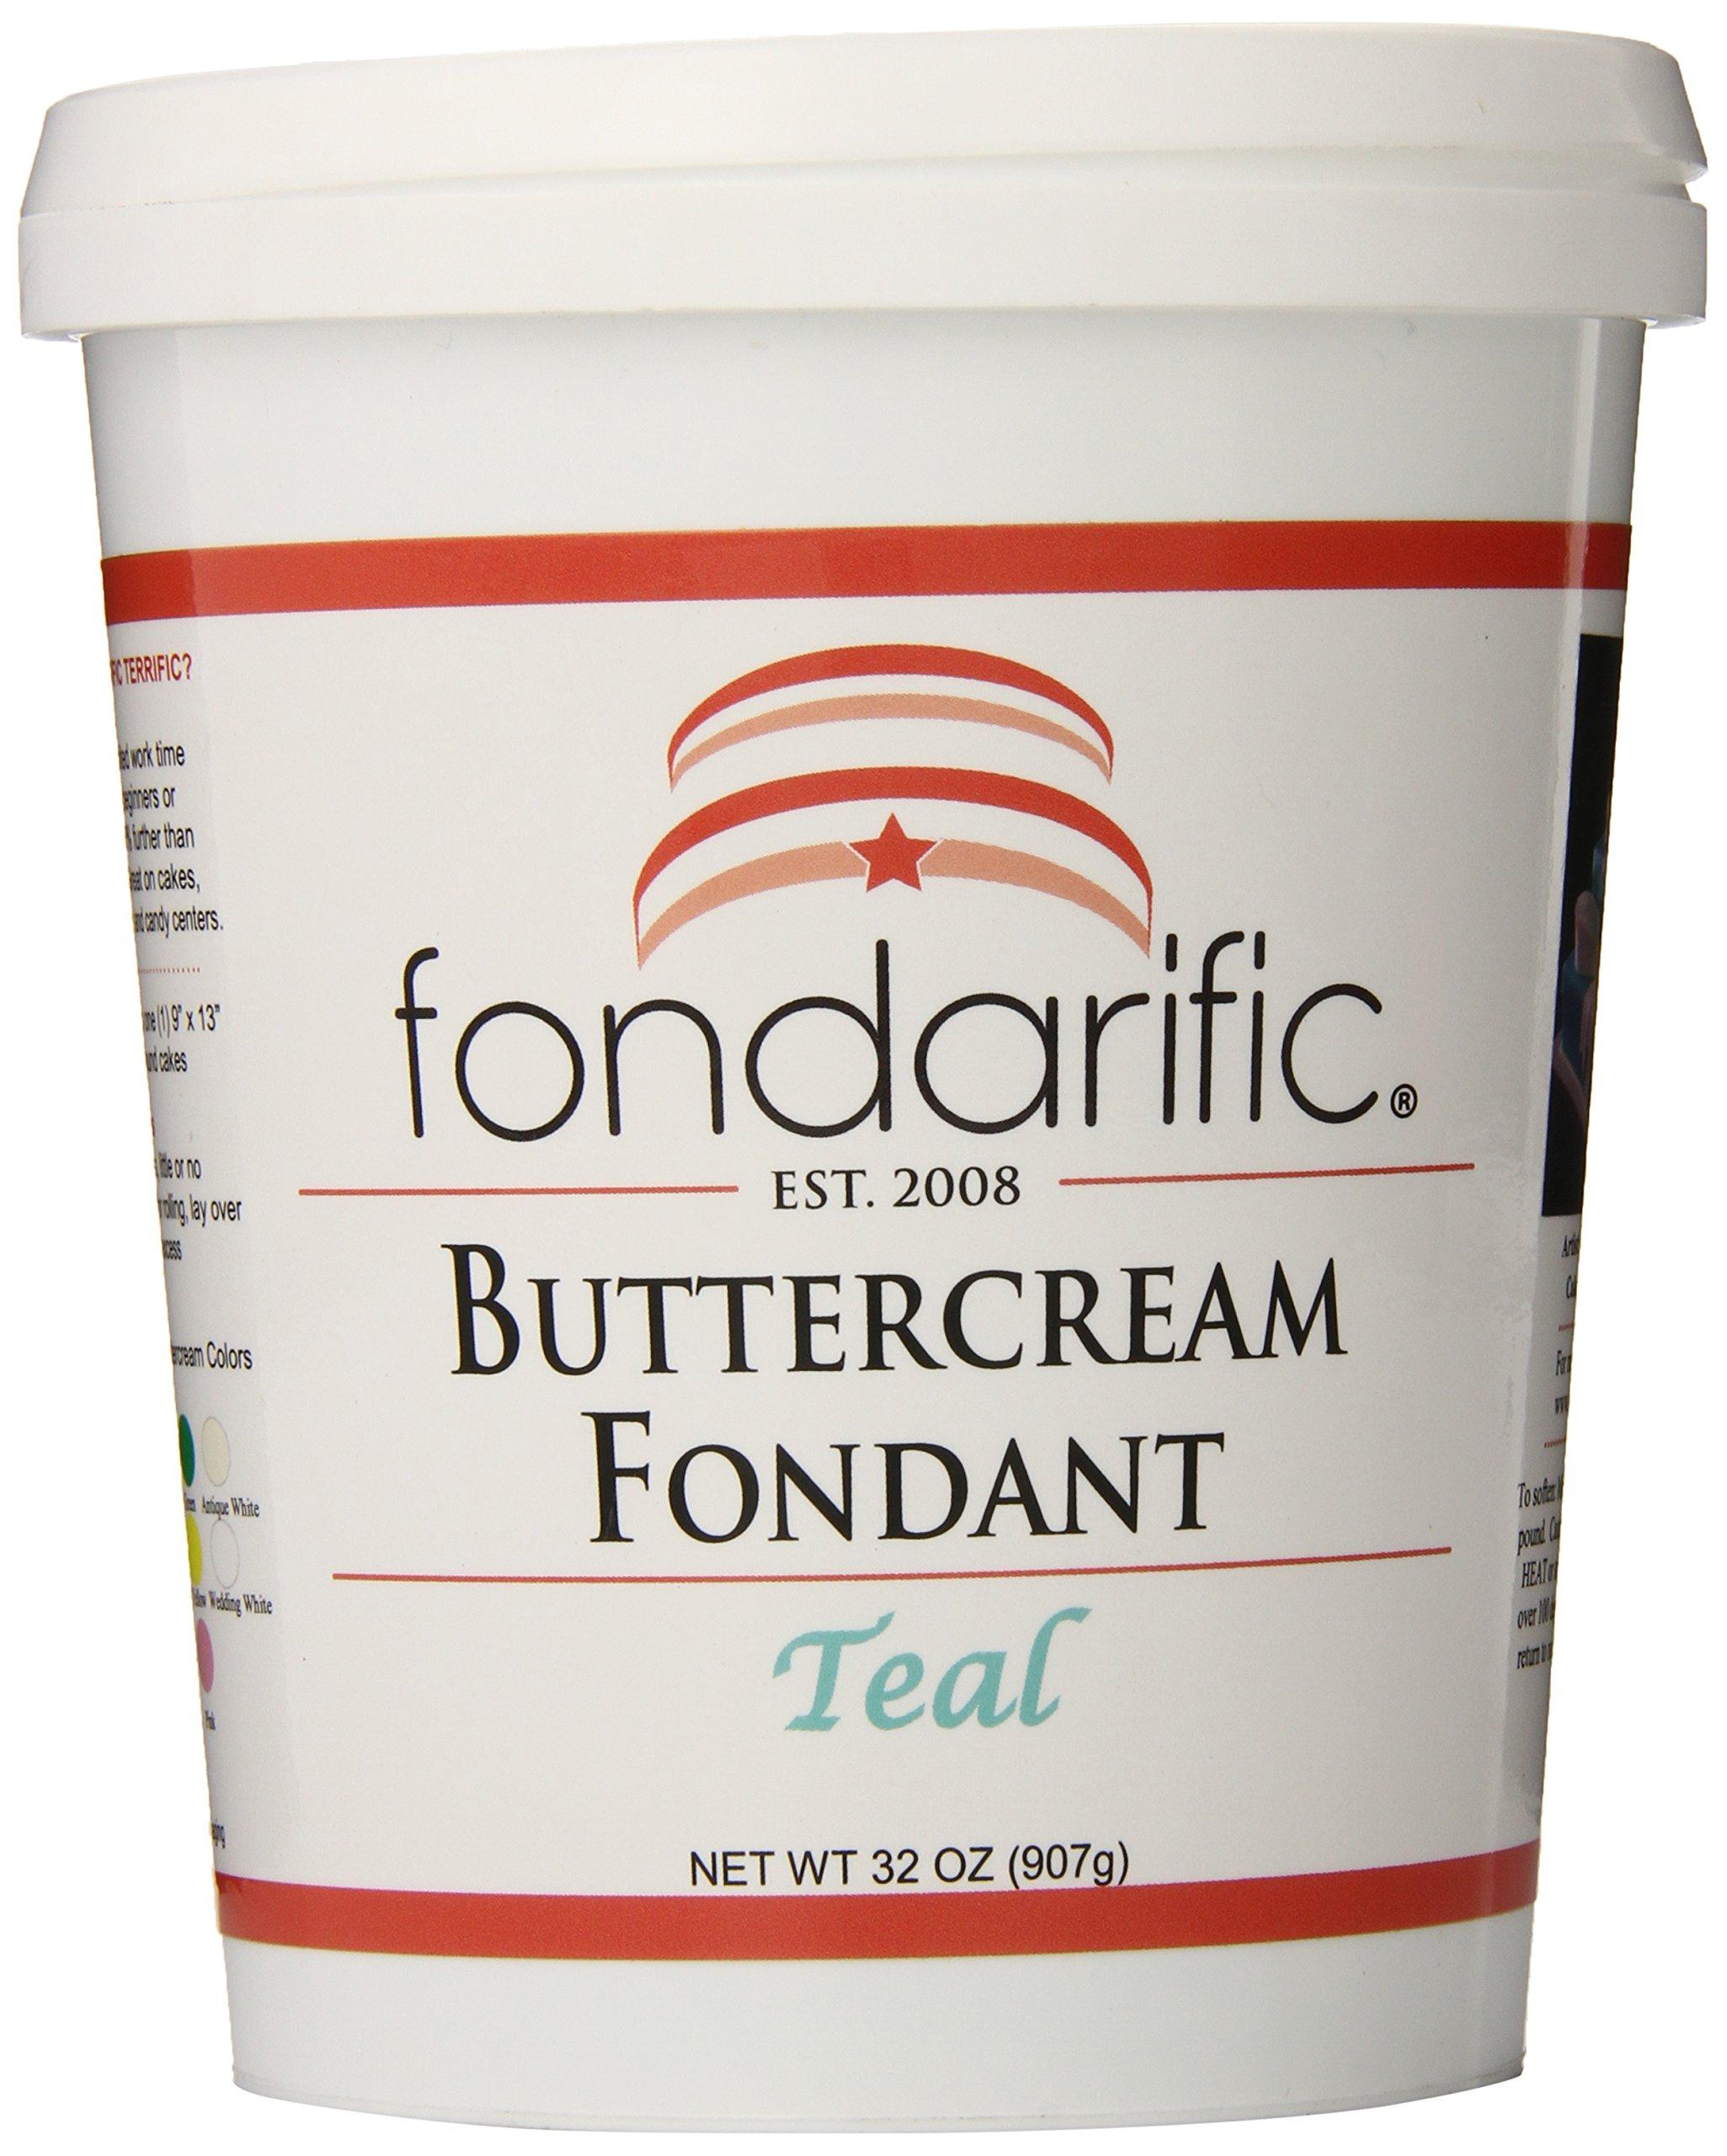 Fondarific Buttercream Teal Fondant, 2-Pounds by Fondarific